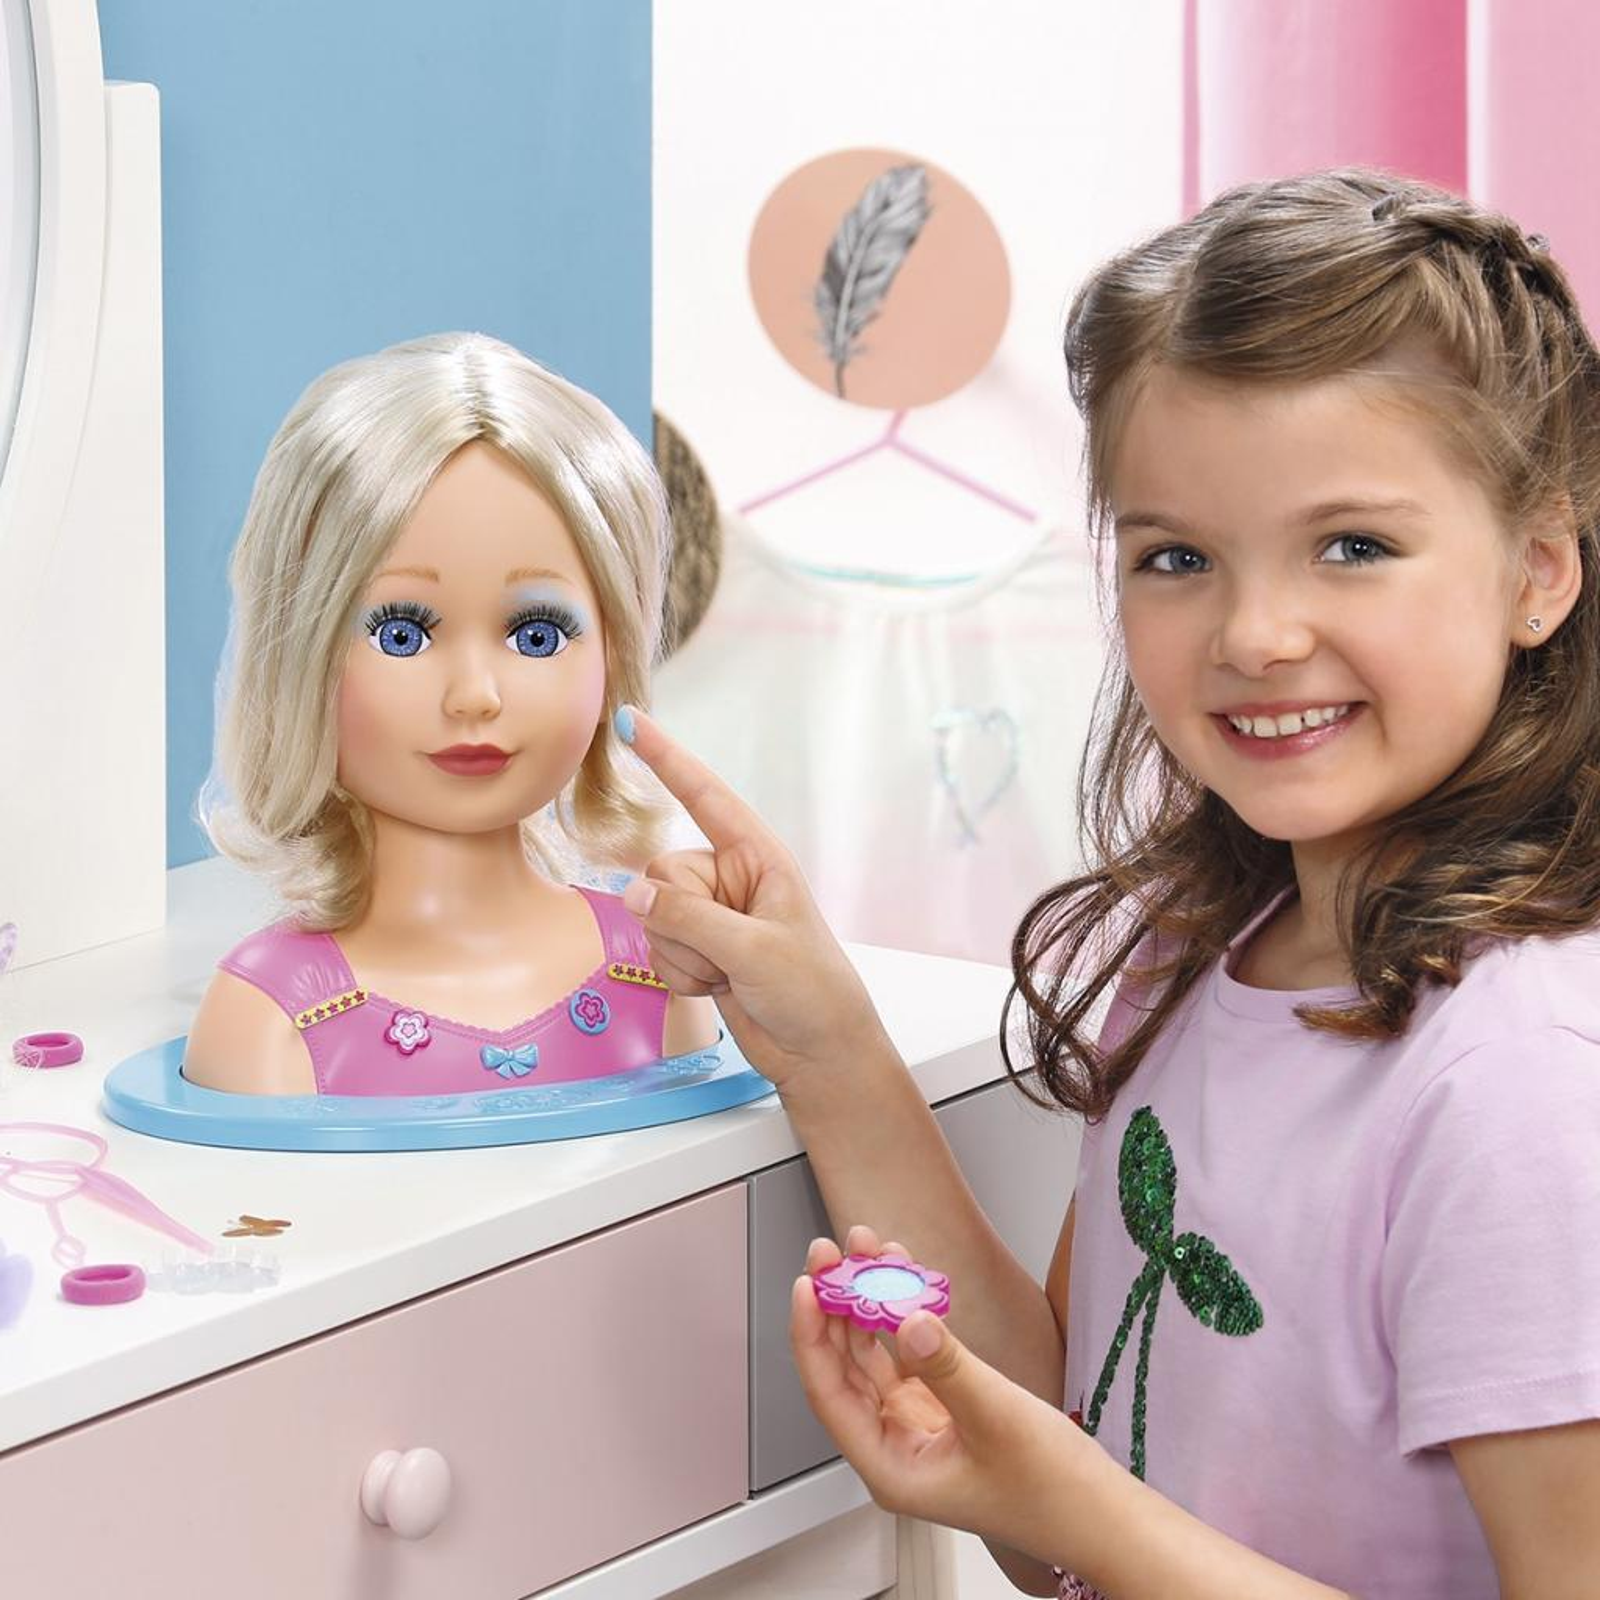 Кукла Zapf манекен My Model Сестричка с аксессуарами (824788) изображение 6